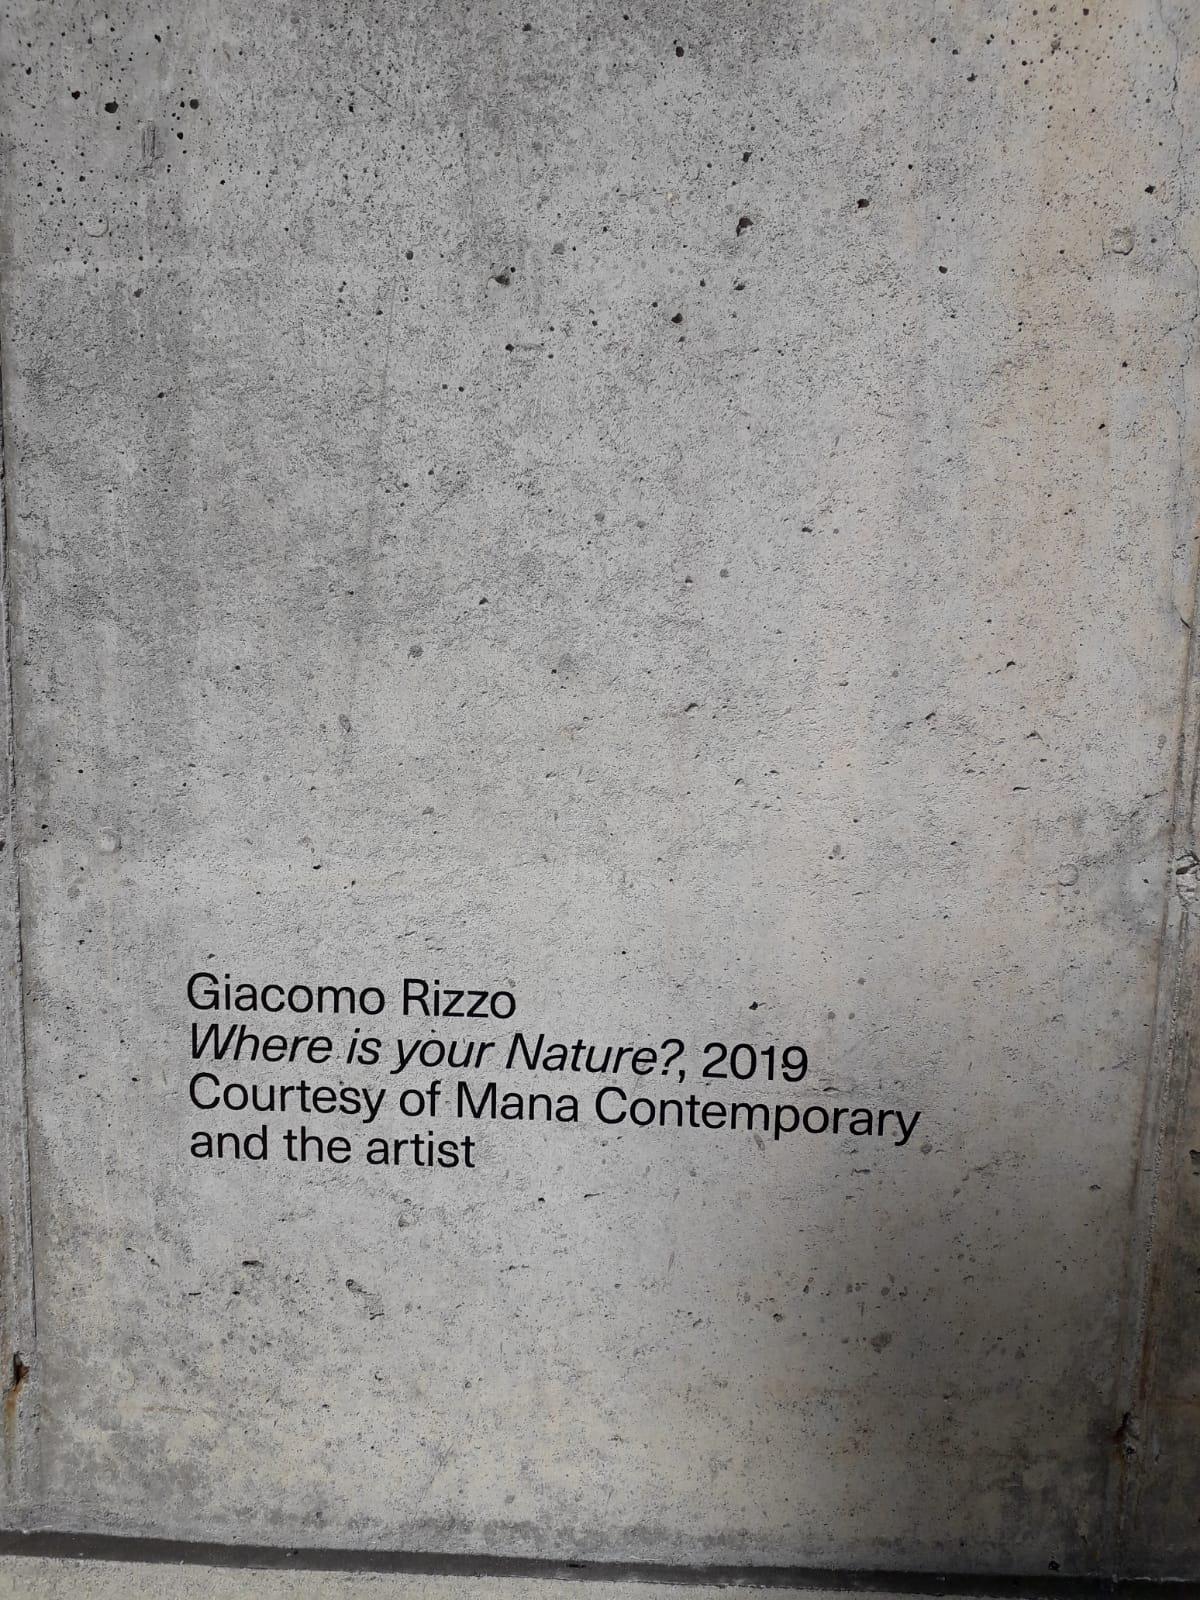 Giacomo_Rizzo_Where_is_your_nature_2019_Courtesy_ofMANA_and_Artist_MANA_Contemporary_NJ_7